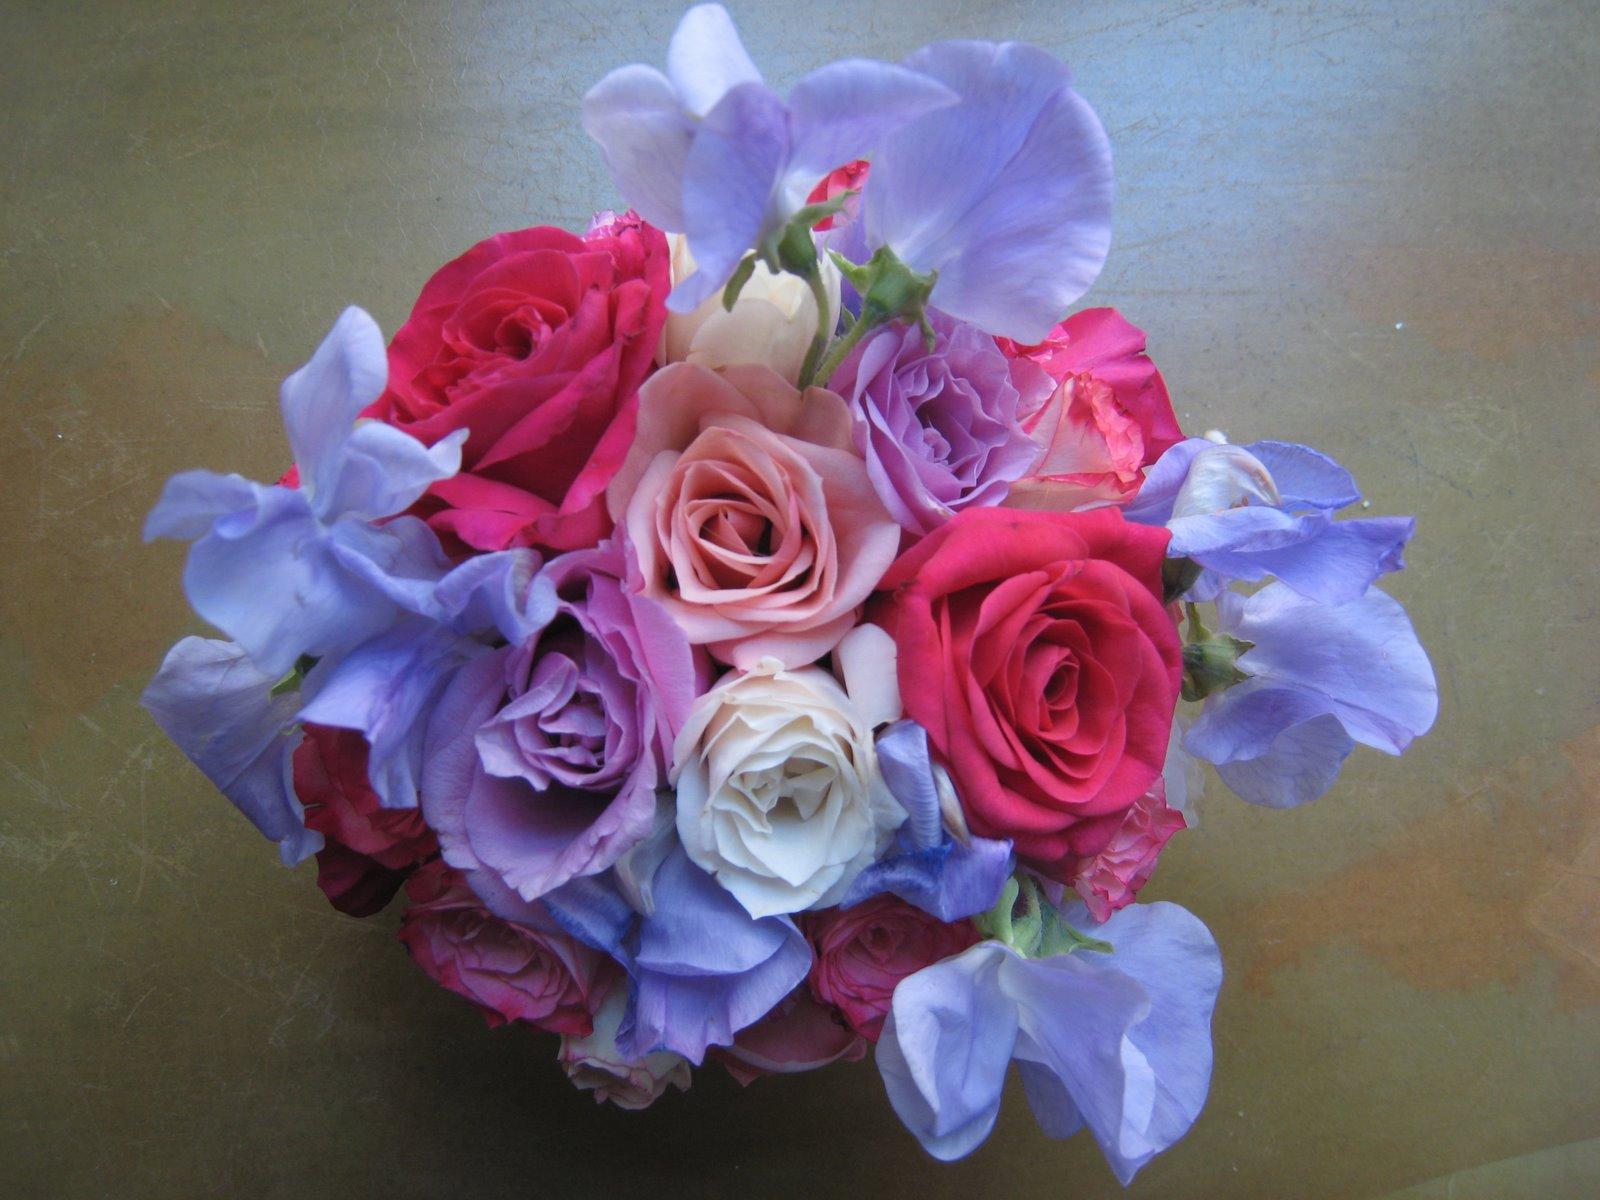 Fotografias de flores rosas (120 fotos de rosas de calidad  - Imagenes De Rosa Y Flores